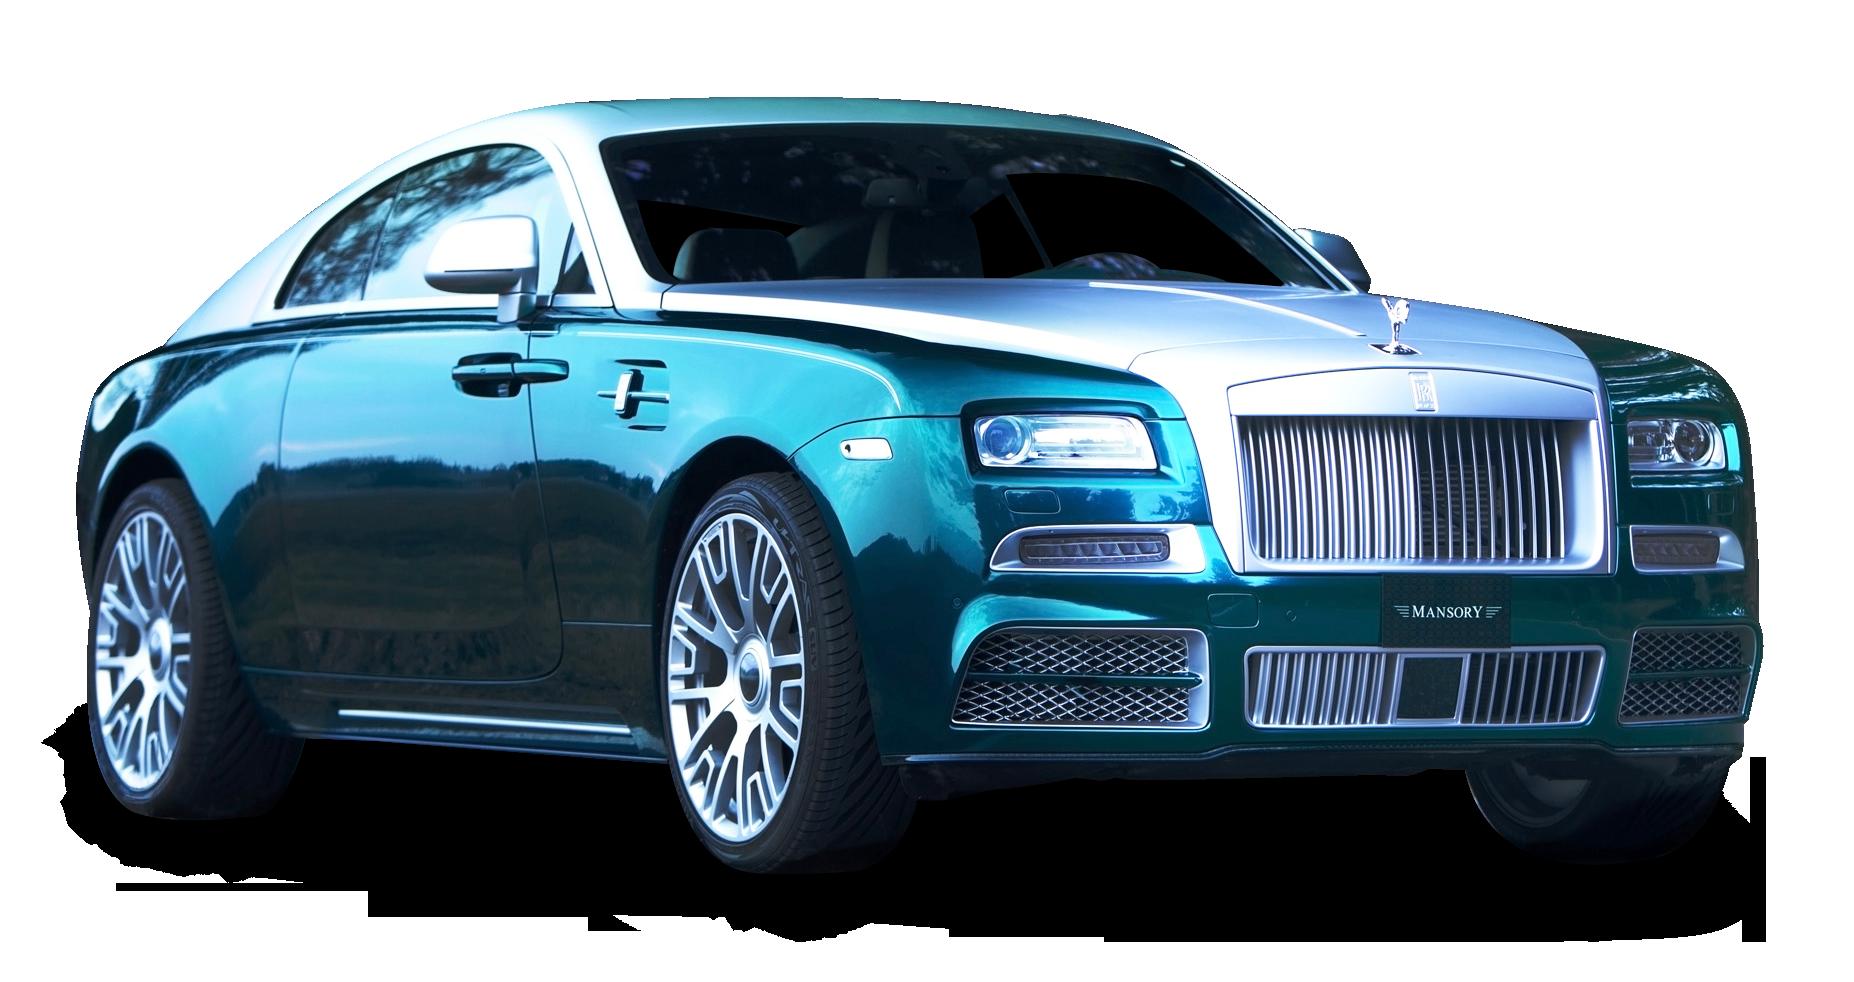 Rolls Royce Wraith Mansory Car